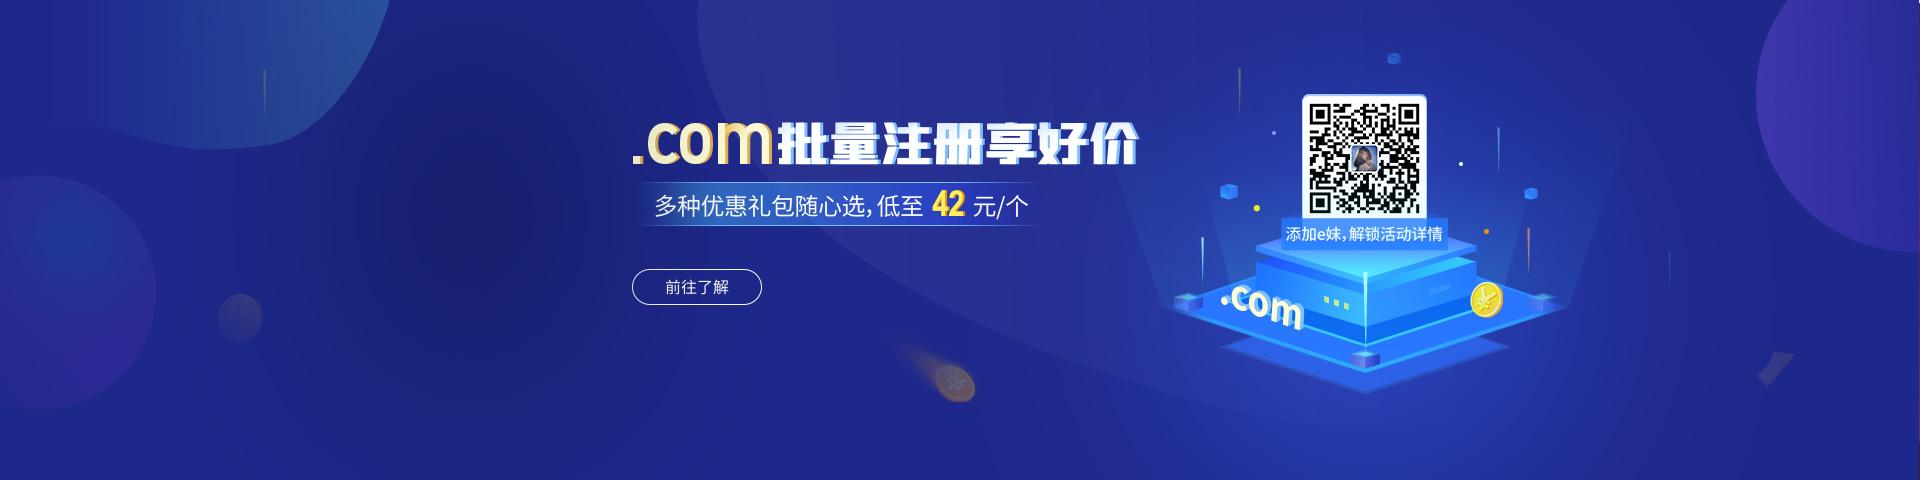 Q4 .com注册活动